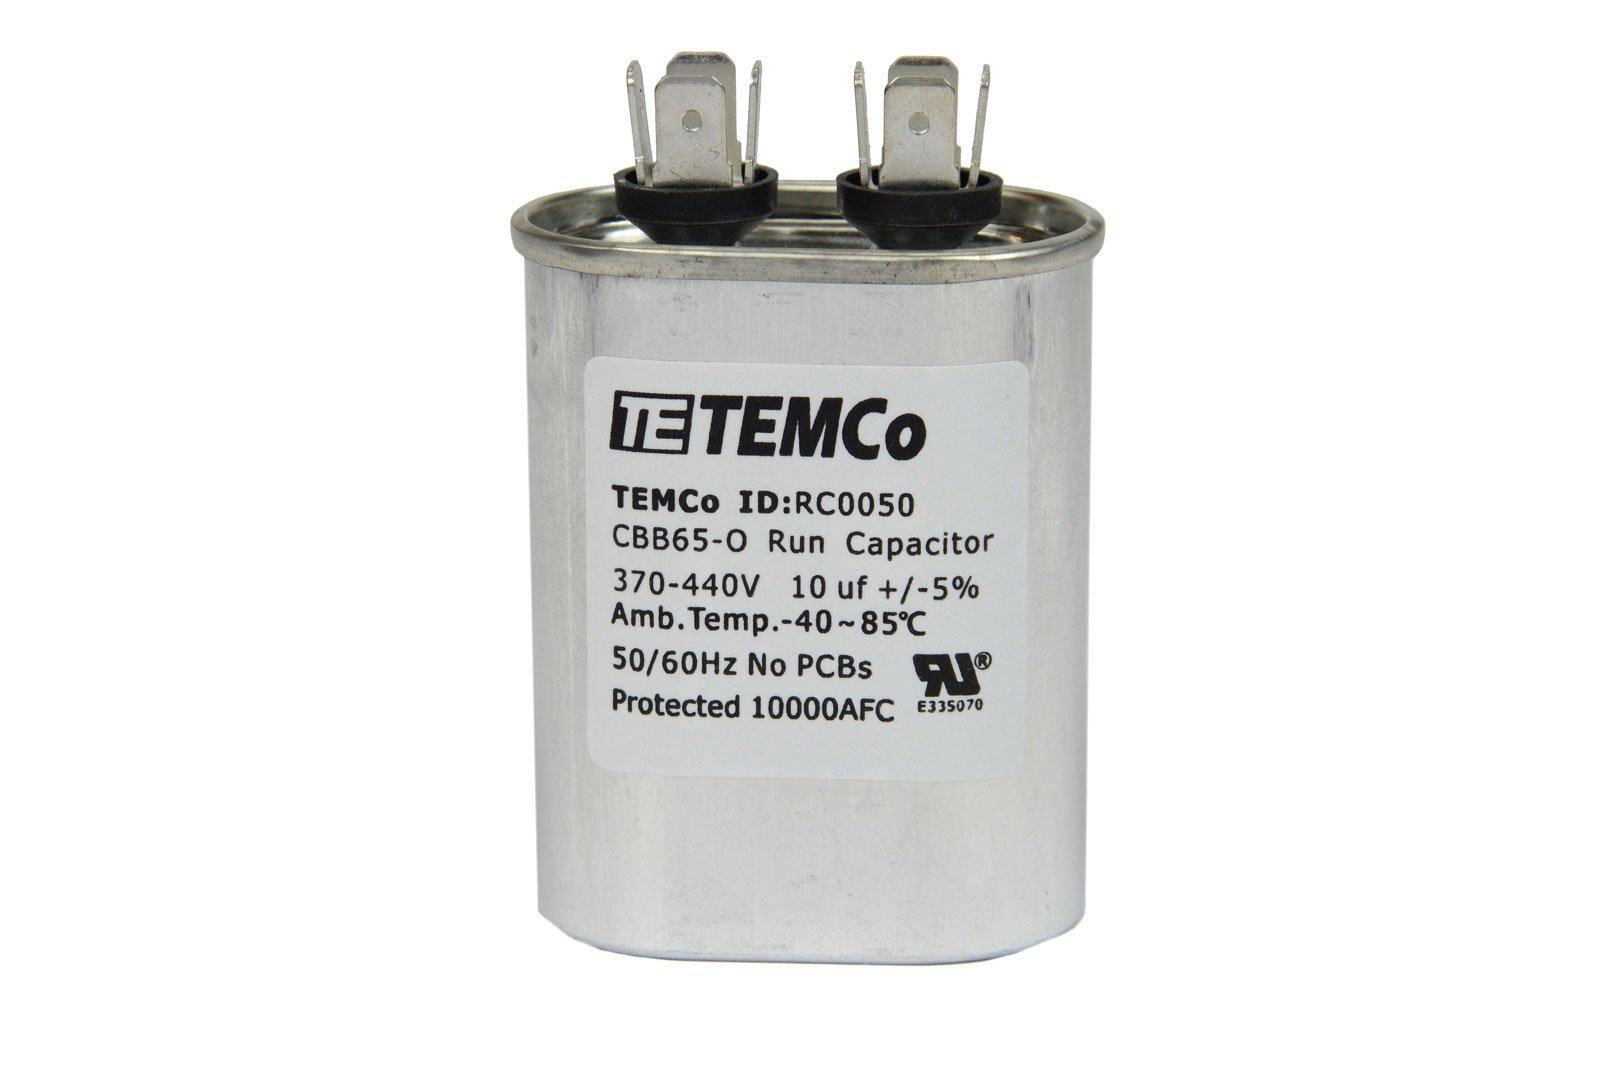 TEMCo 25 LOT Motor Run Capacitor RC0072-10 mfd uf 370/440 V VAC volt 10 uf Oval HVAC TEMCo AC Electric by Temco (Image #3)